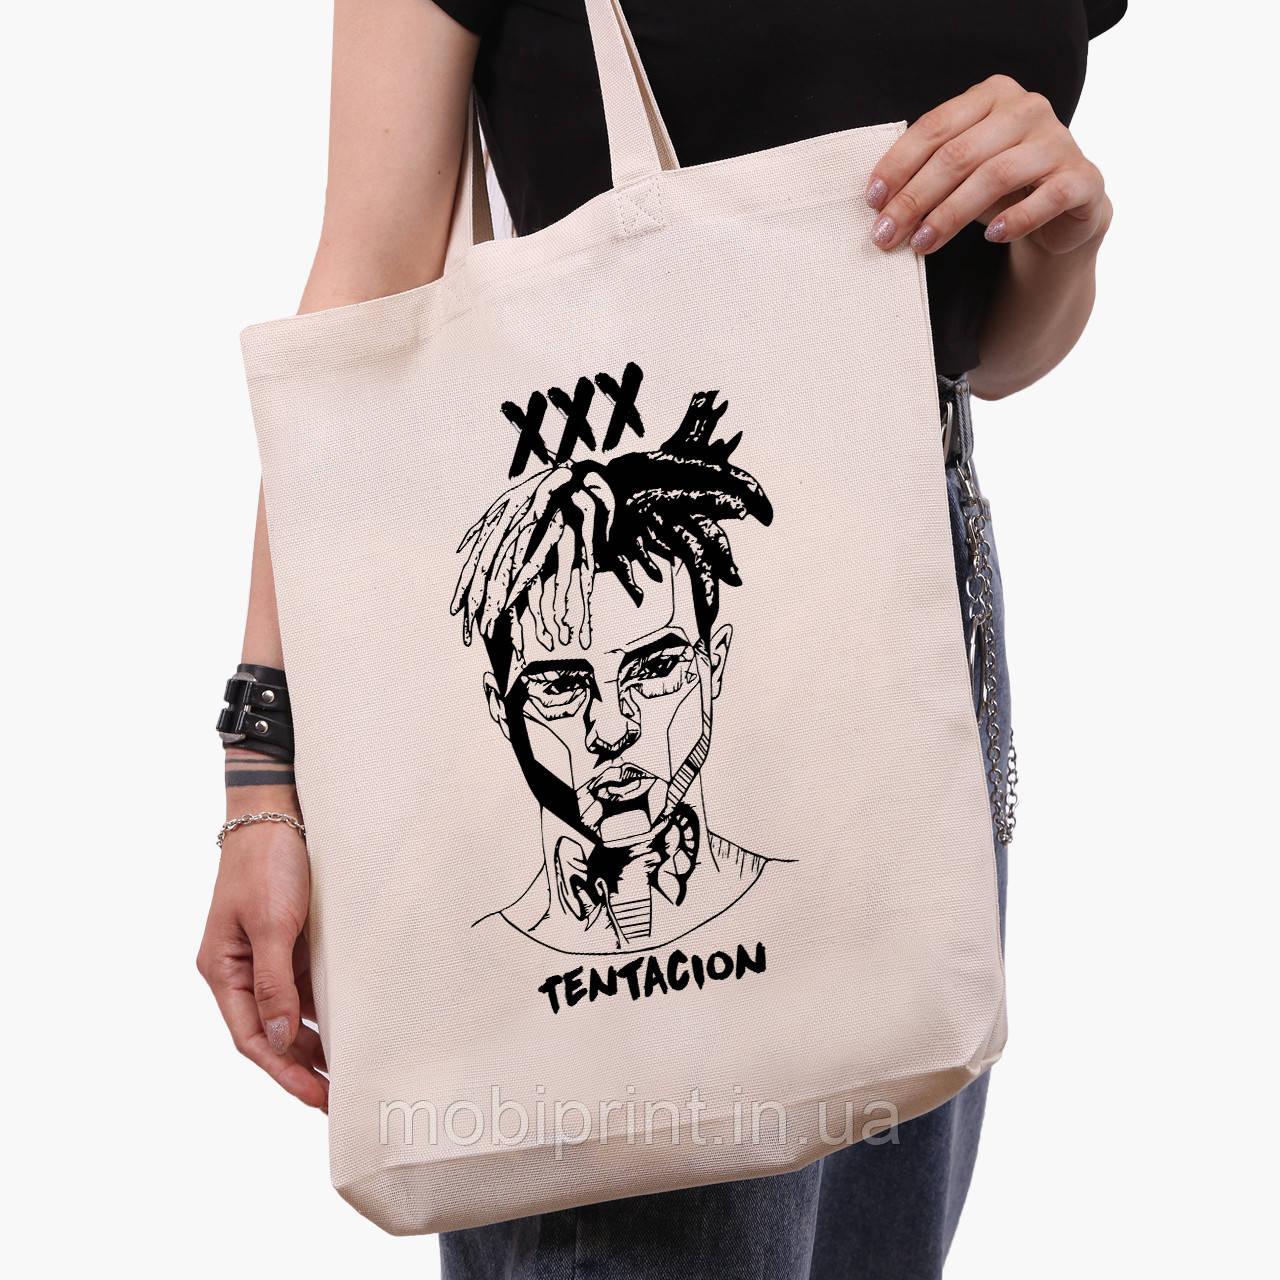 Еко сумка шоппер біла Екс-екс-екс Тентасьон (XXXTentacion) (9227-2637-1) 41*39*8 см